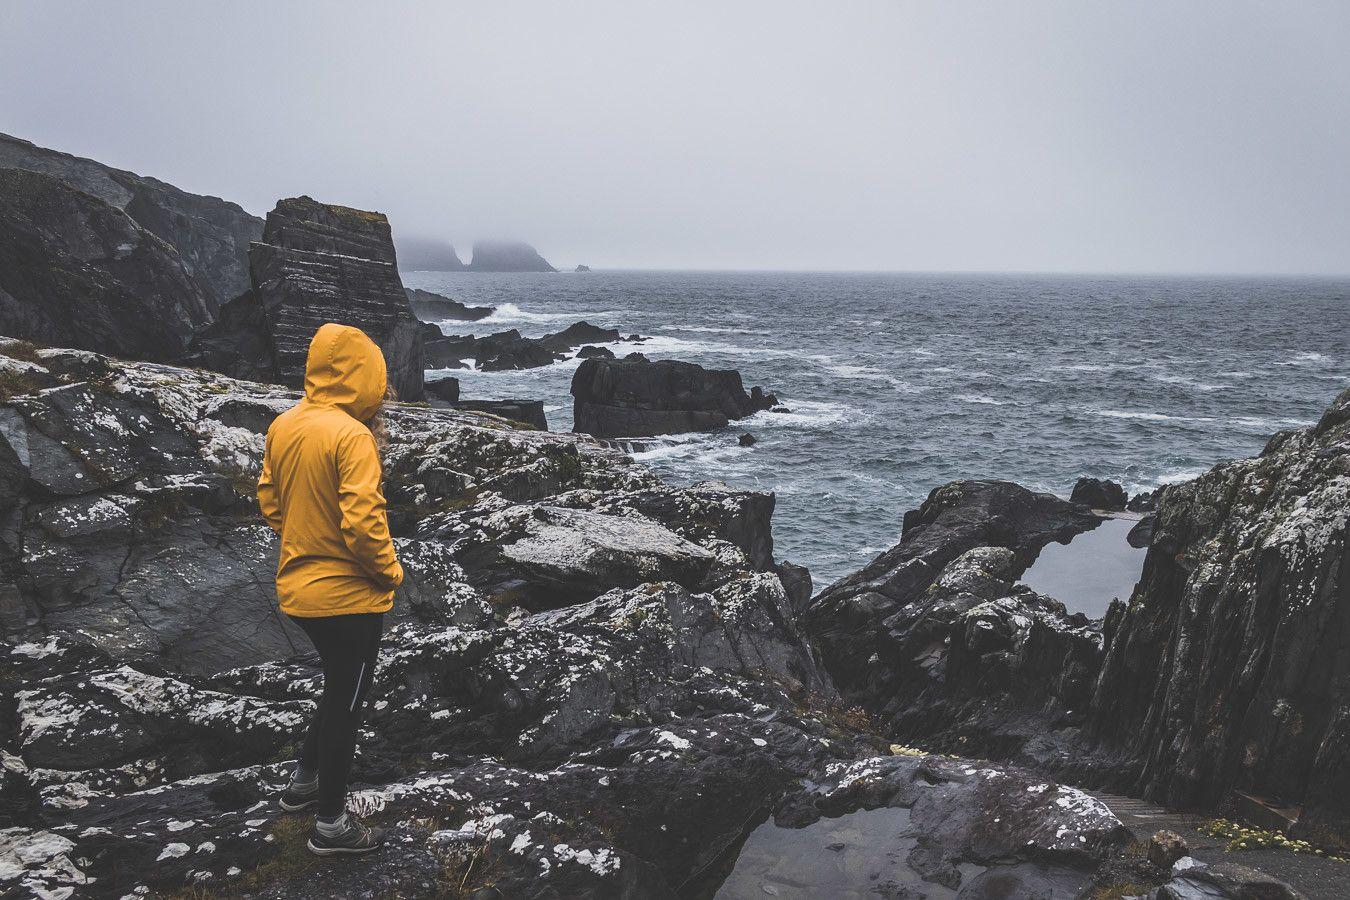 Falaises de la péninsule de Mizen Head en Irlande